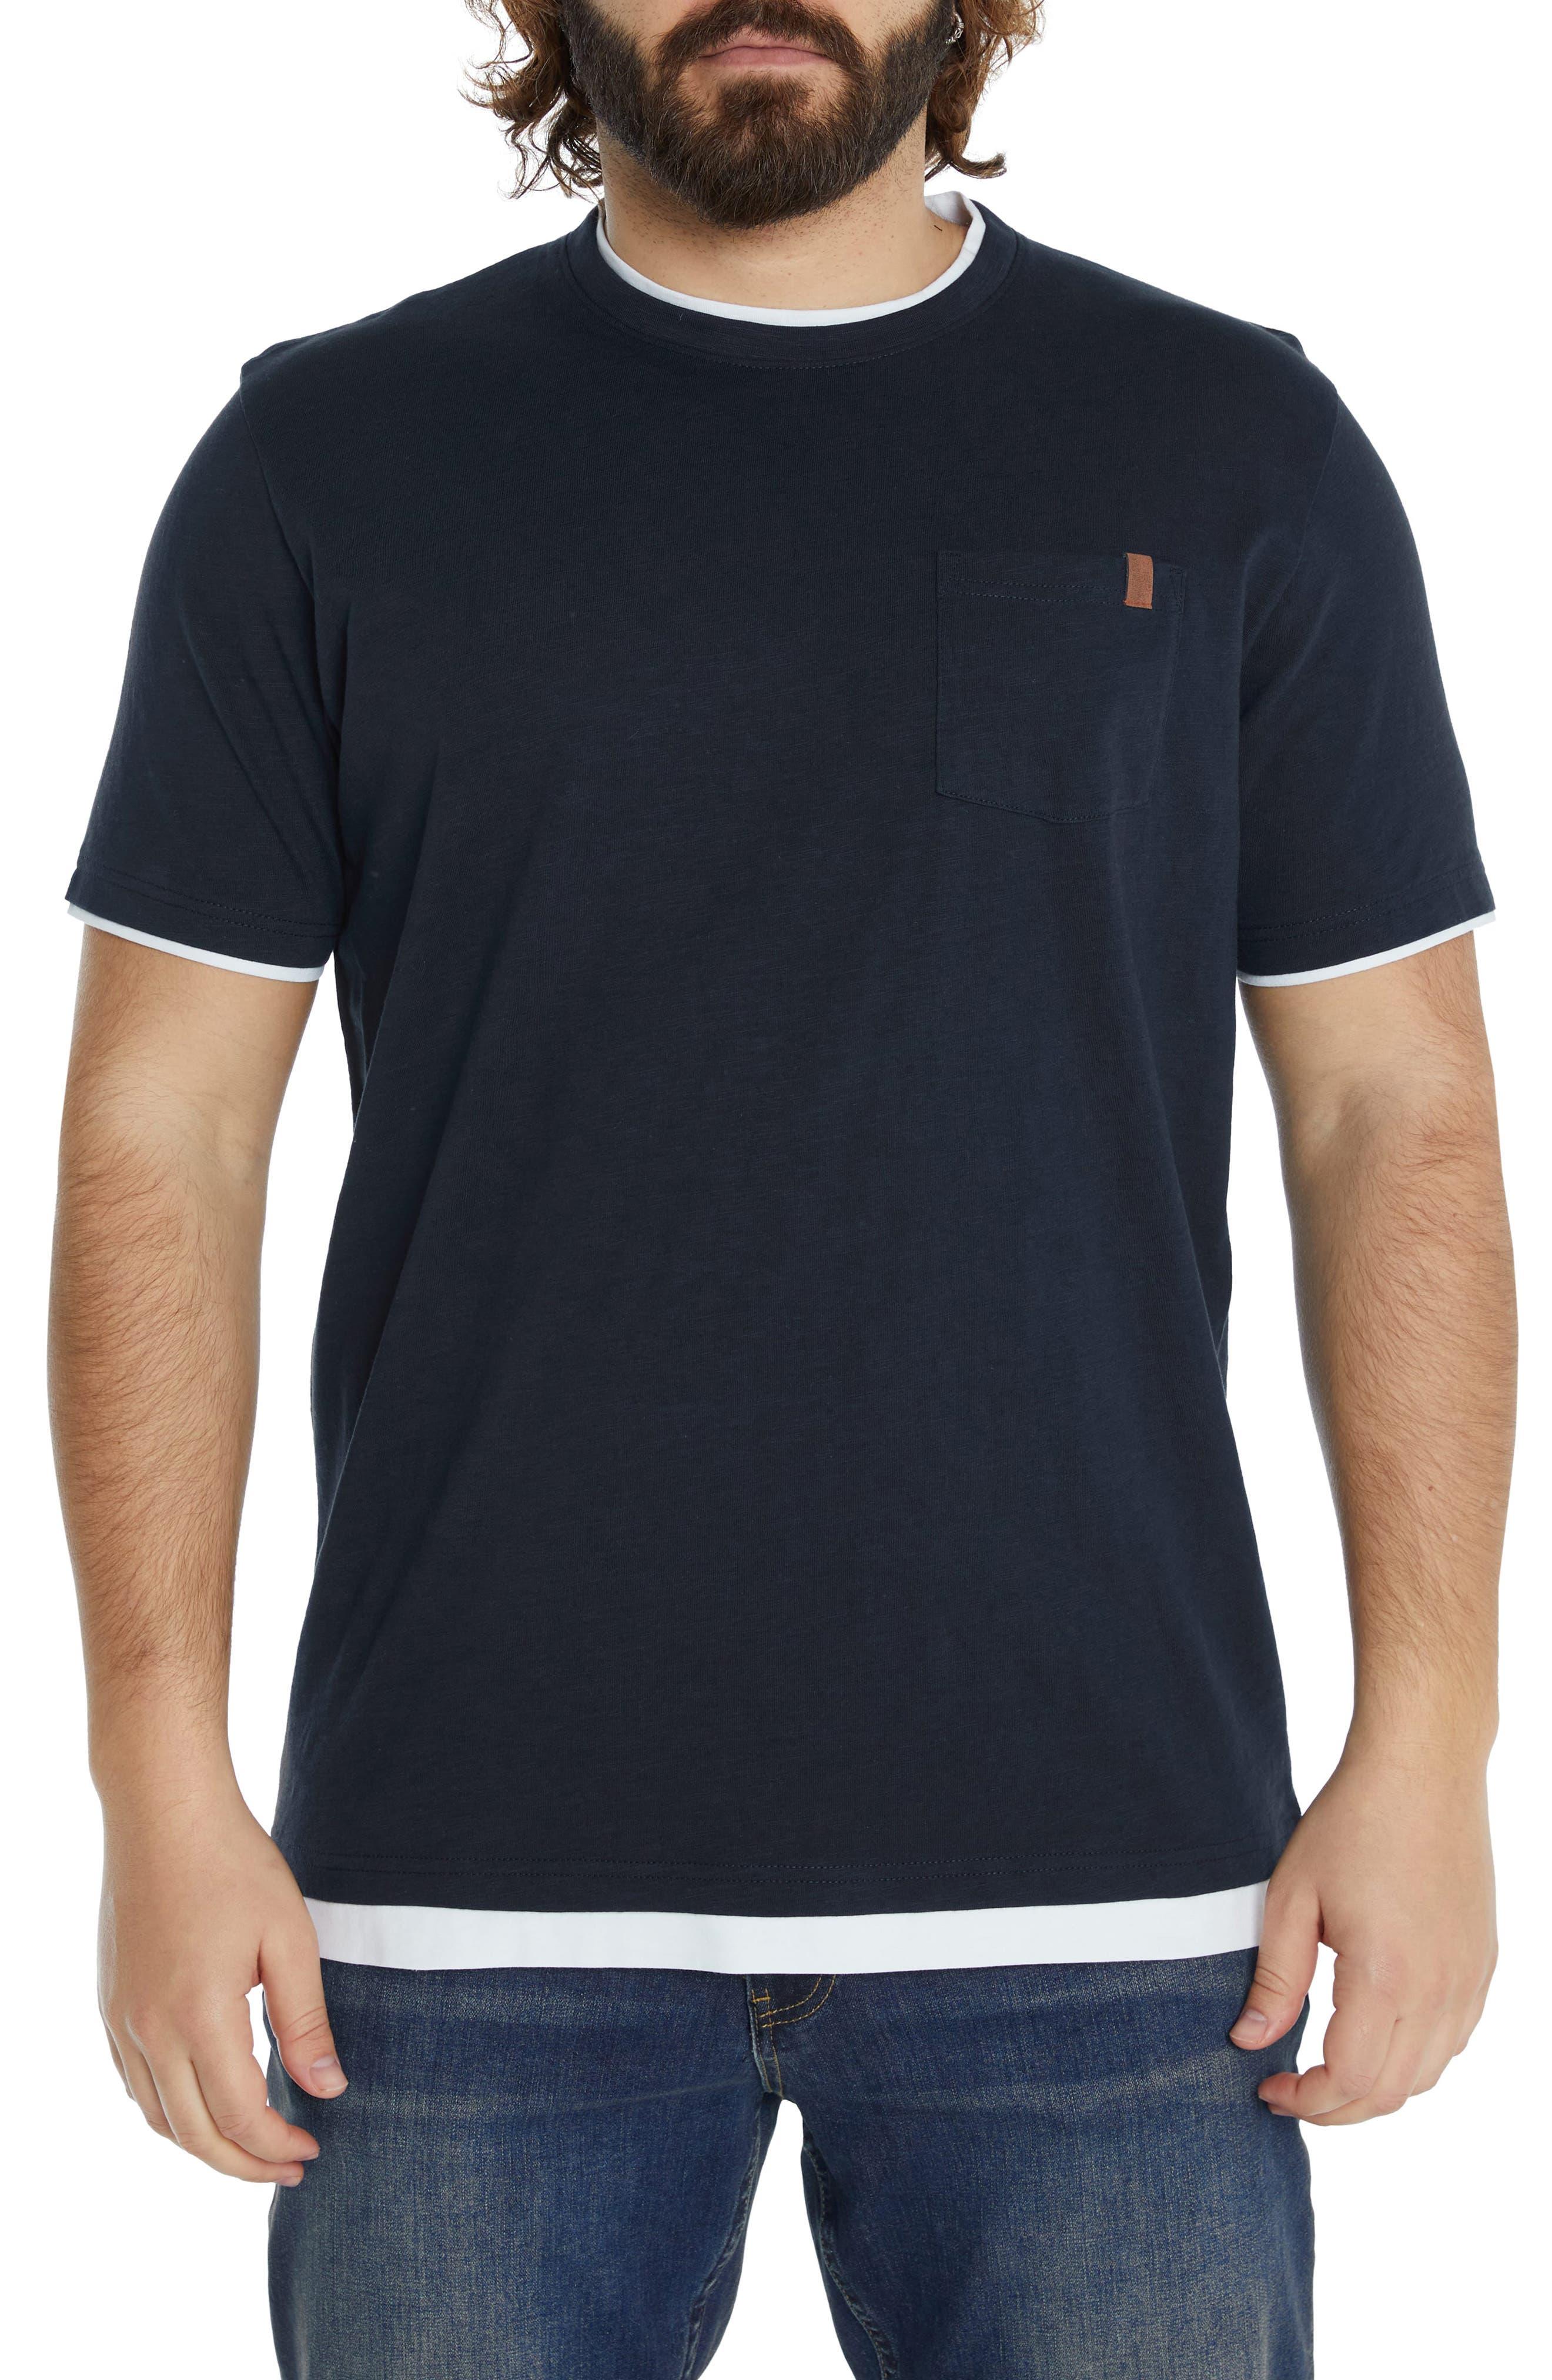 Layered Look Cotton Pocket T-Shirt